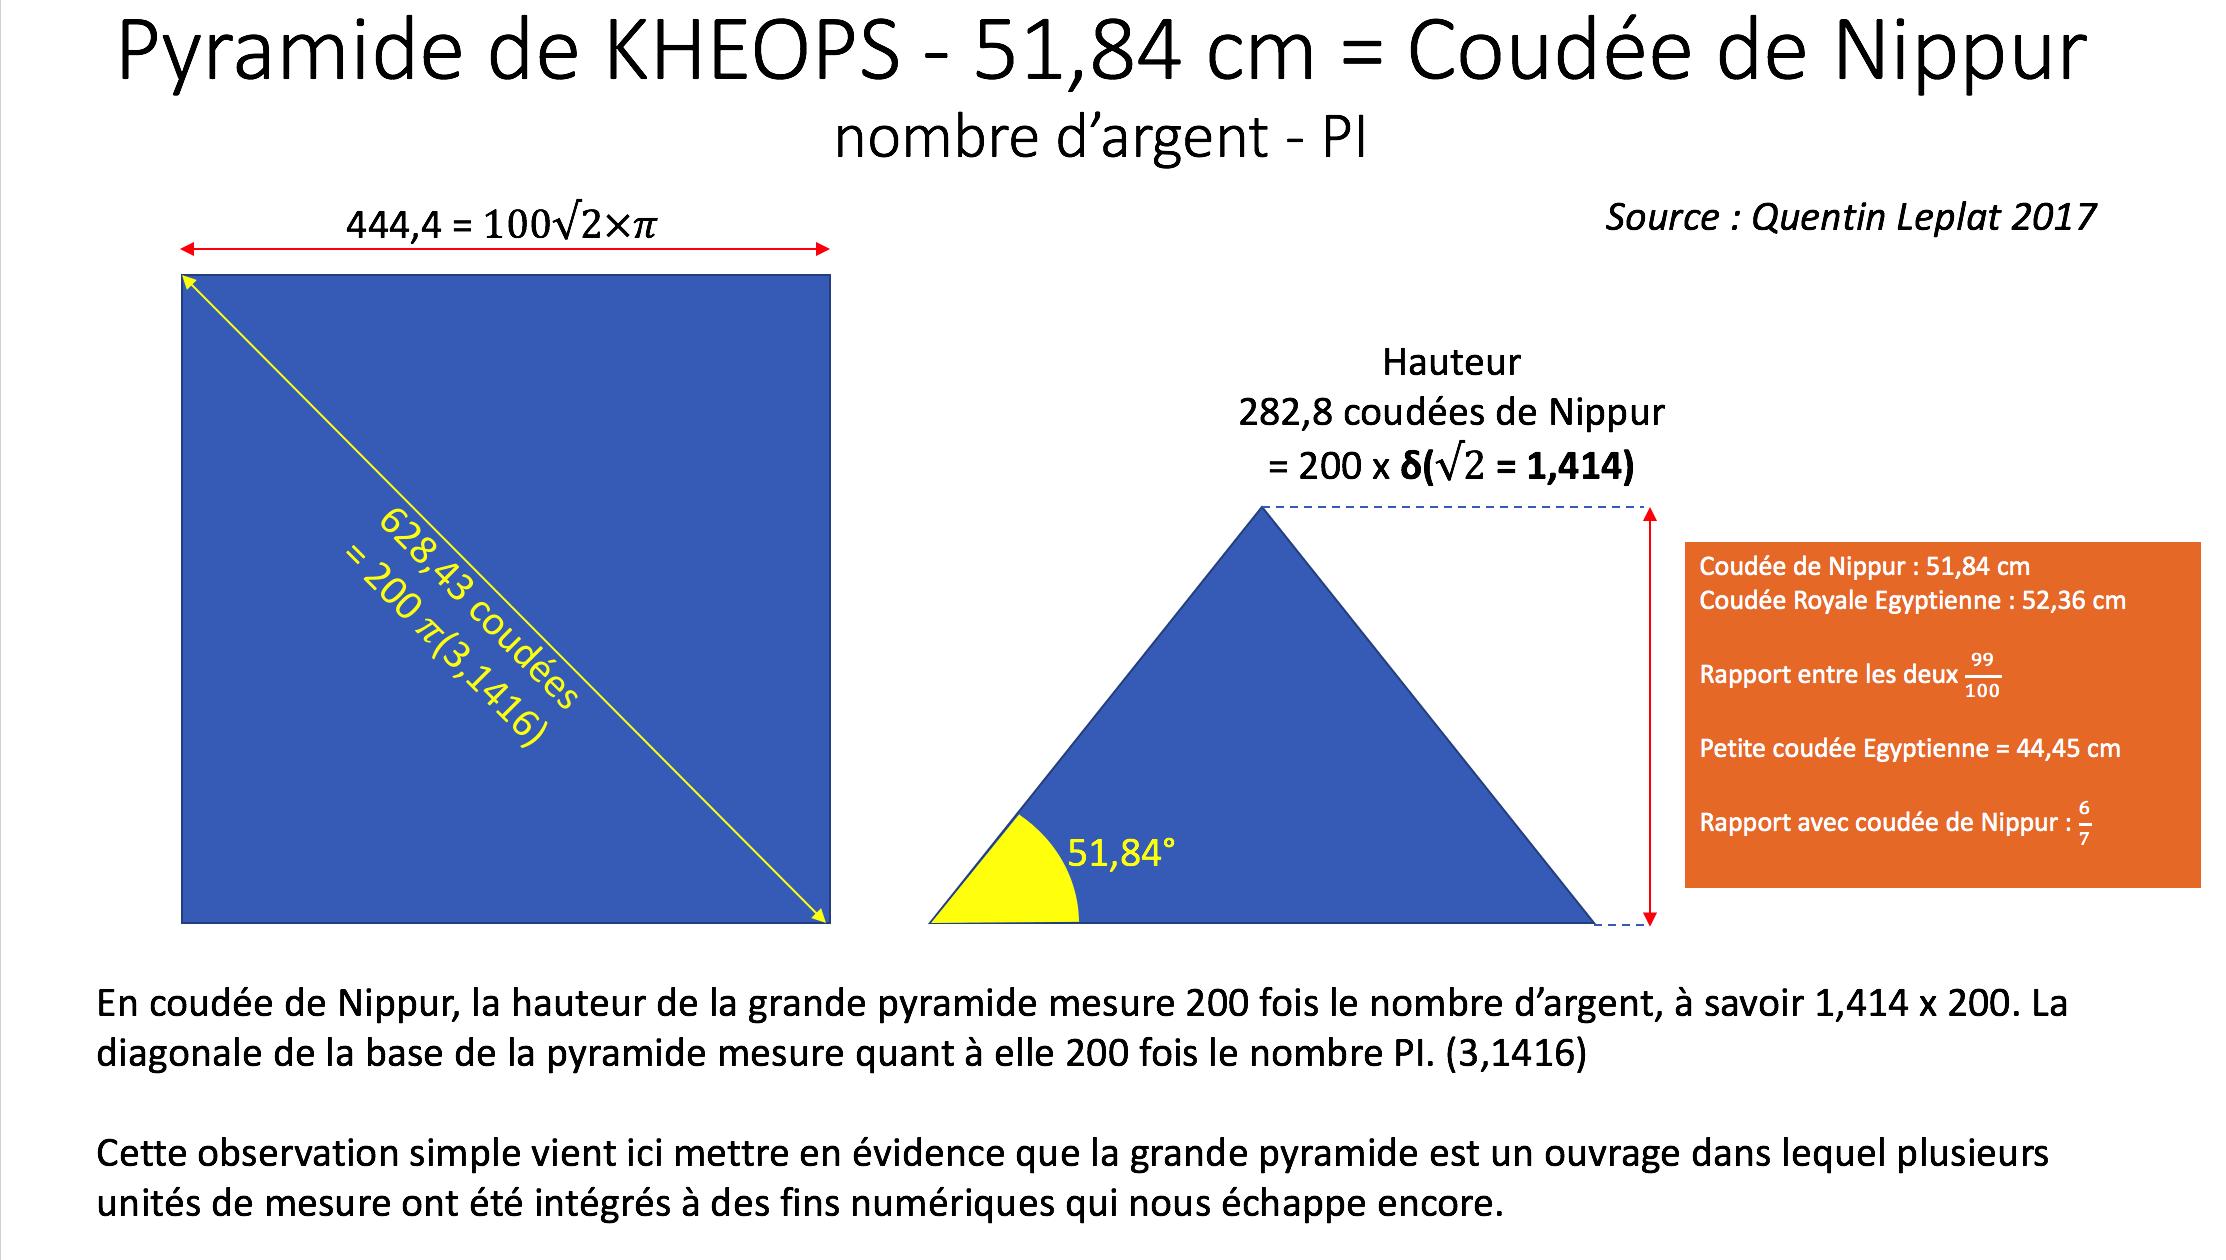 2017-10-18 21:58:59